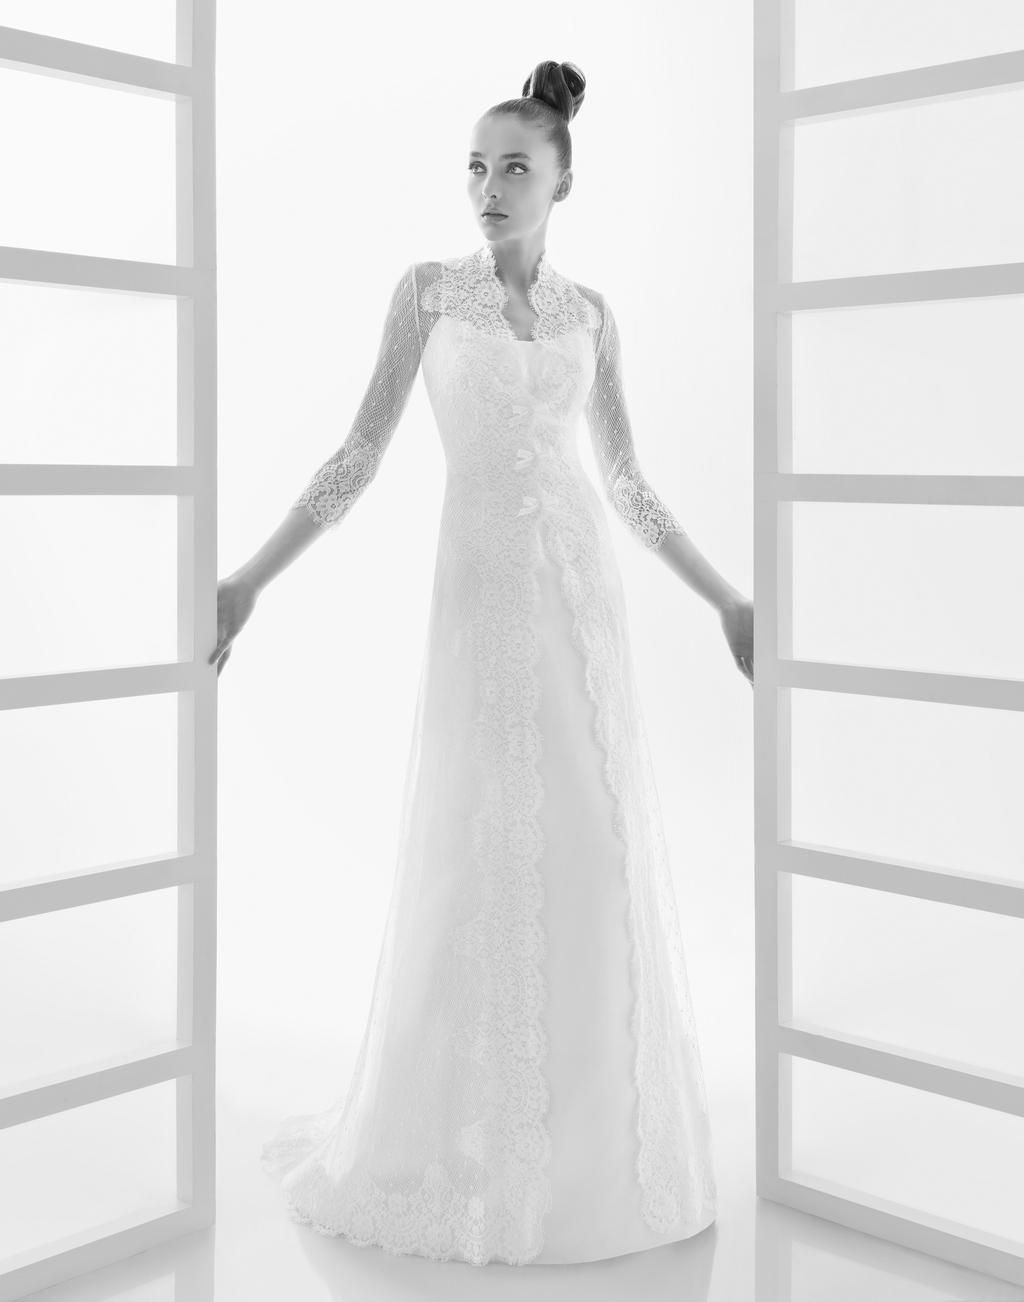 211-edurne-modified-a-line-lace-wedding-dress-sheer-bolero.full